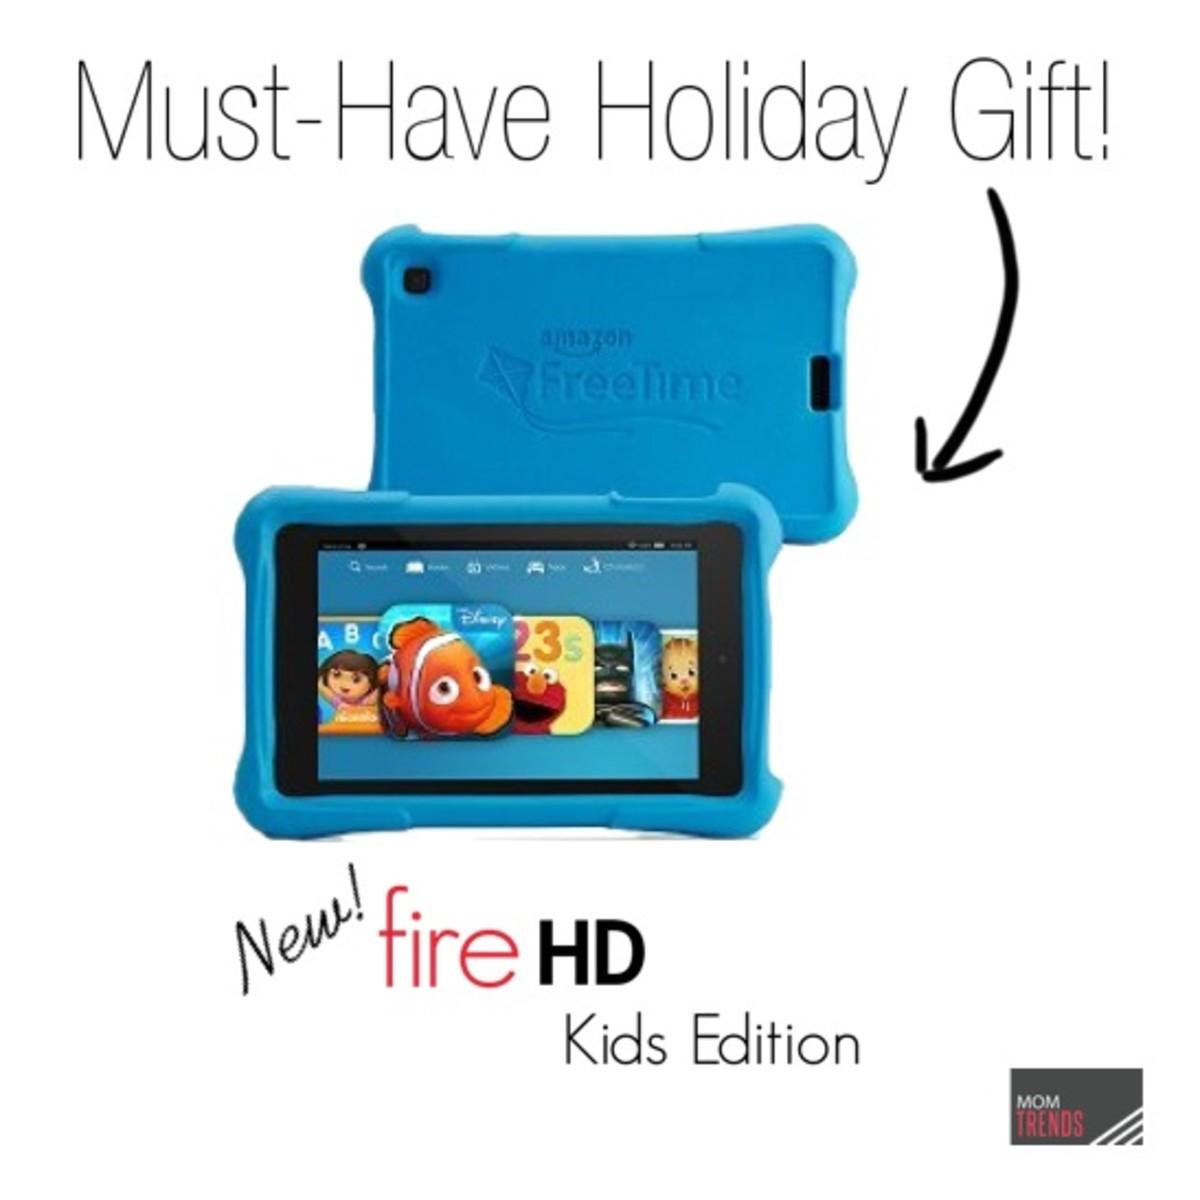 hot holiday toys 2014